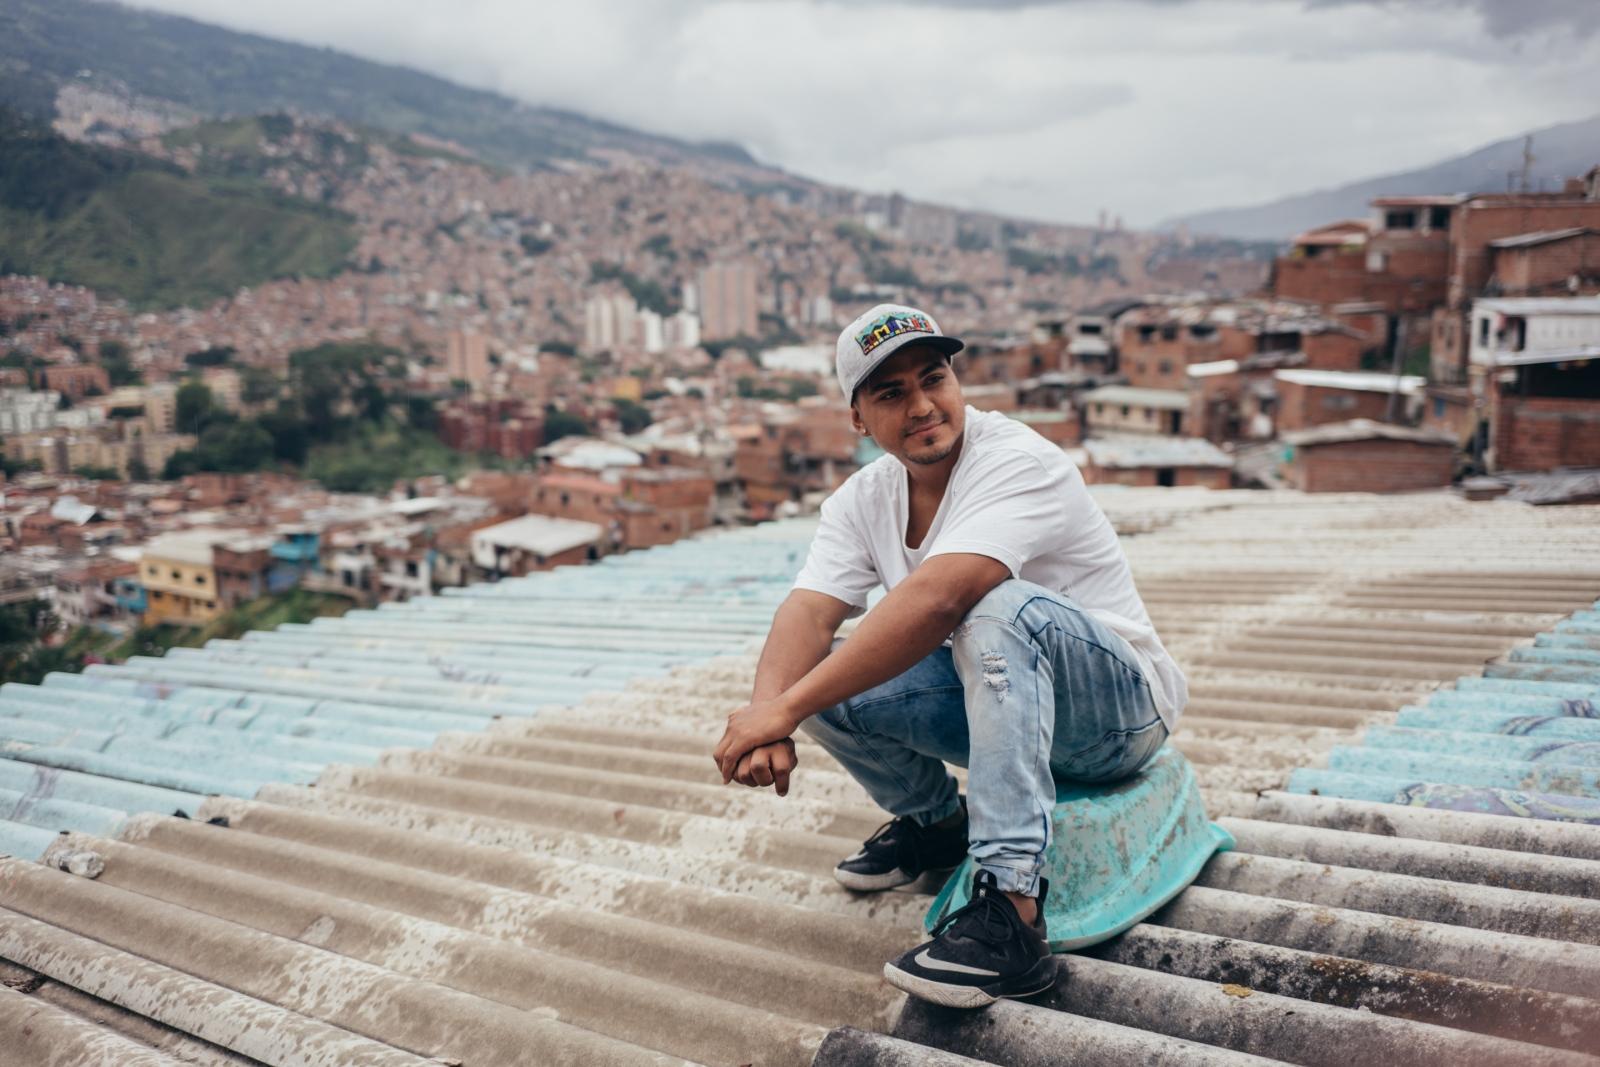 Chotta, Muralista Comuna 13, Medellin 2019